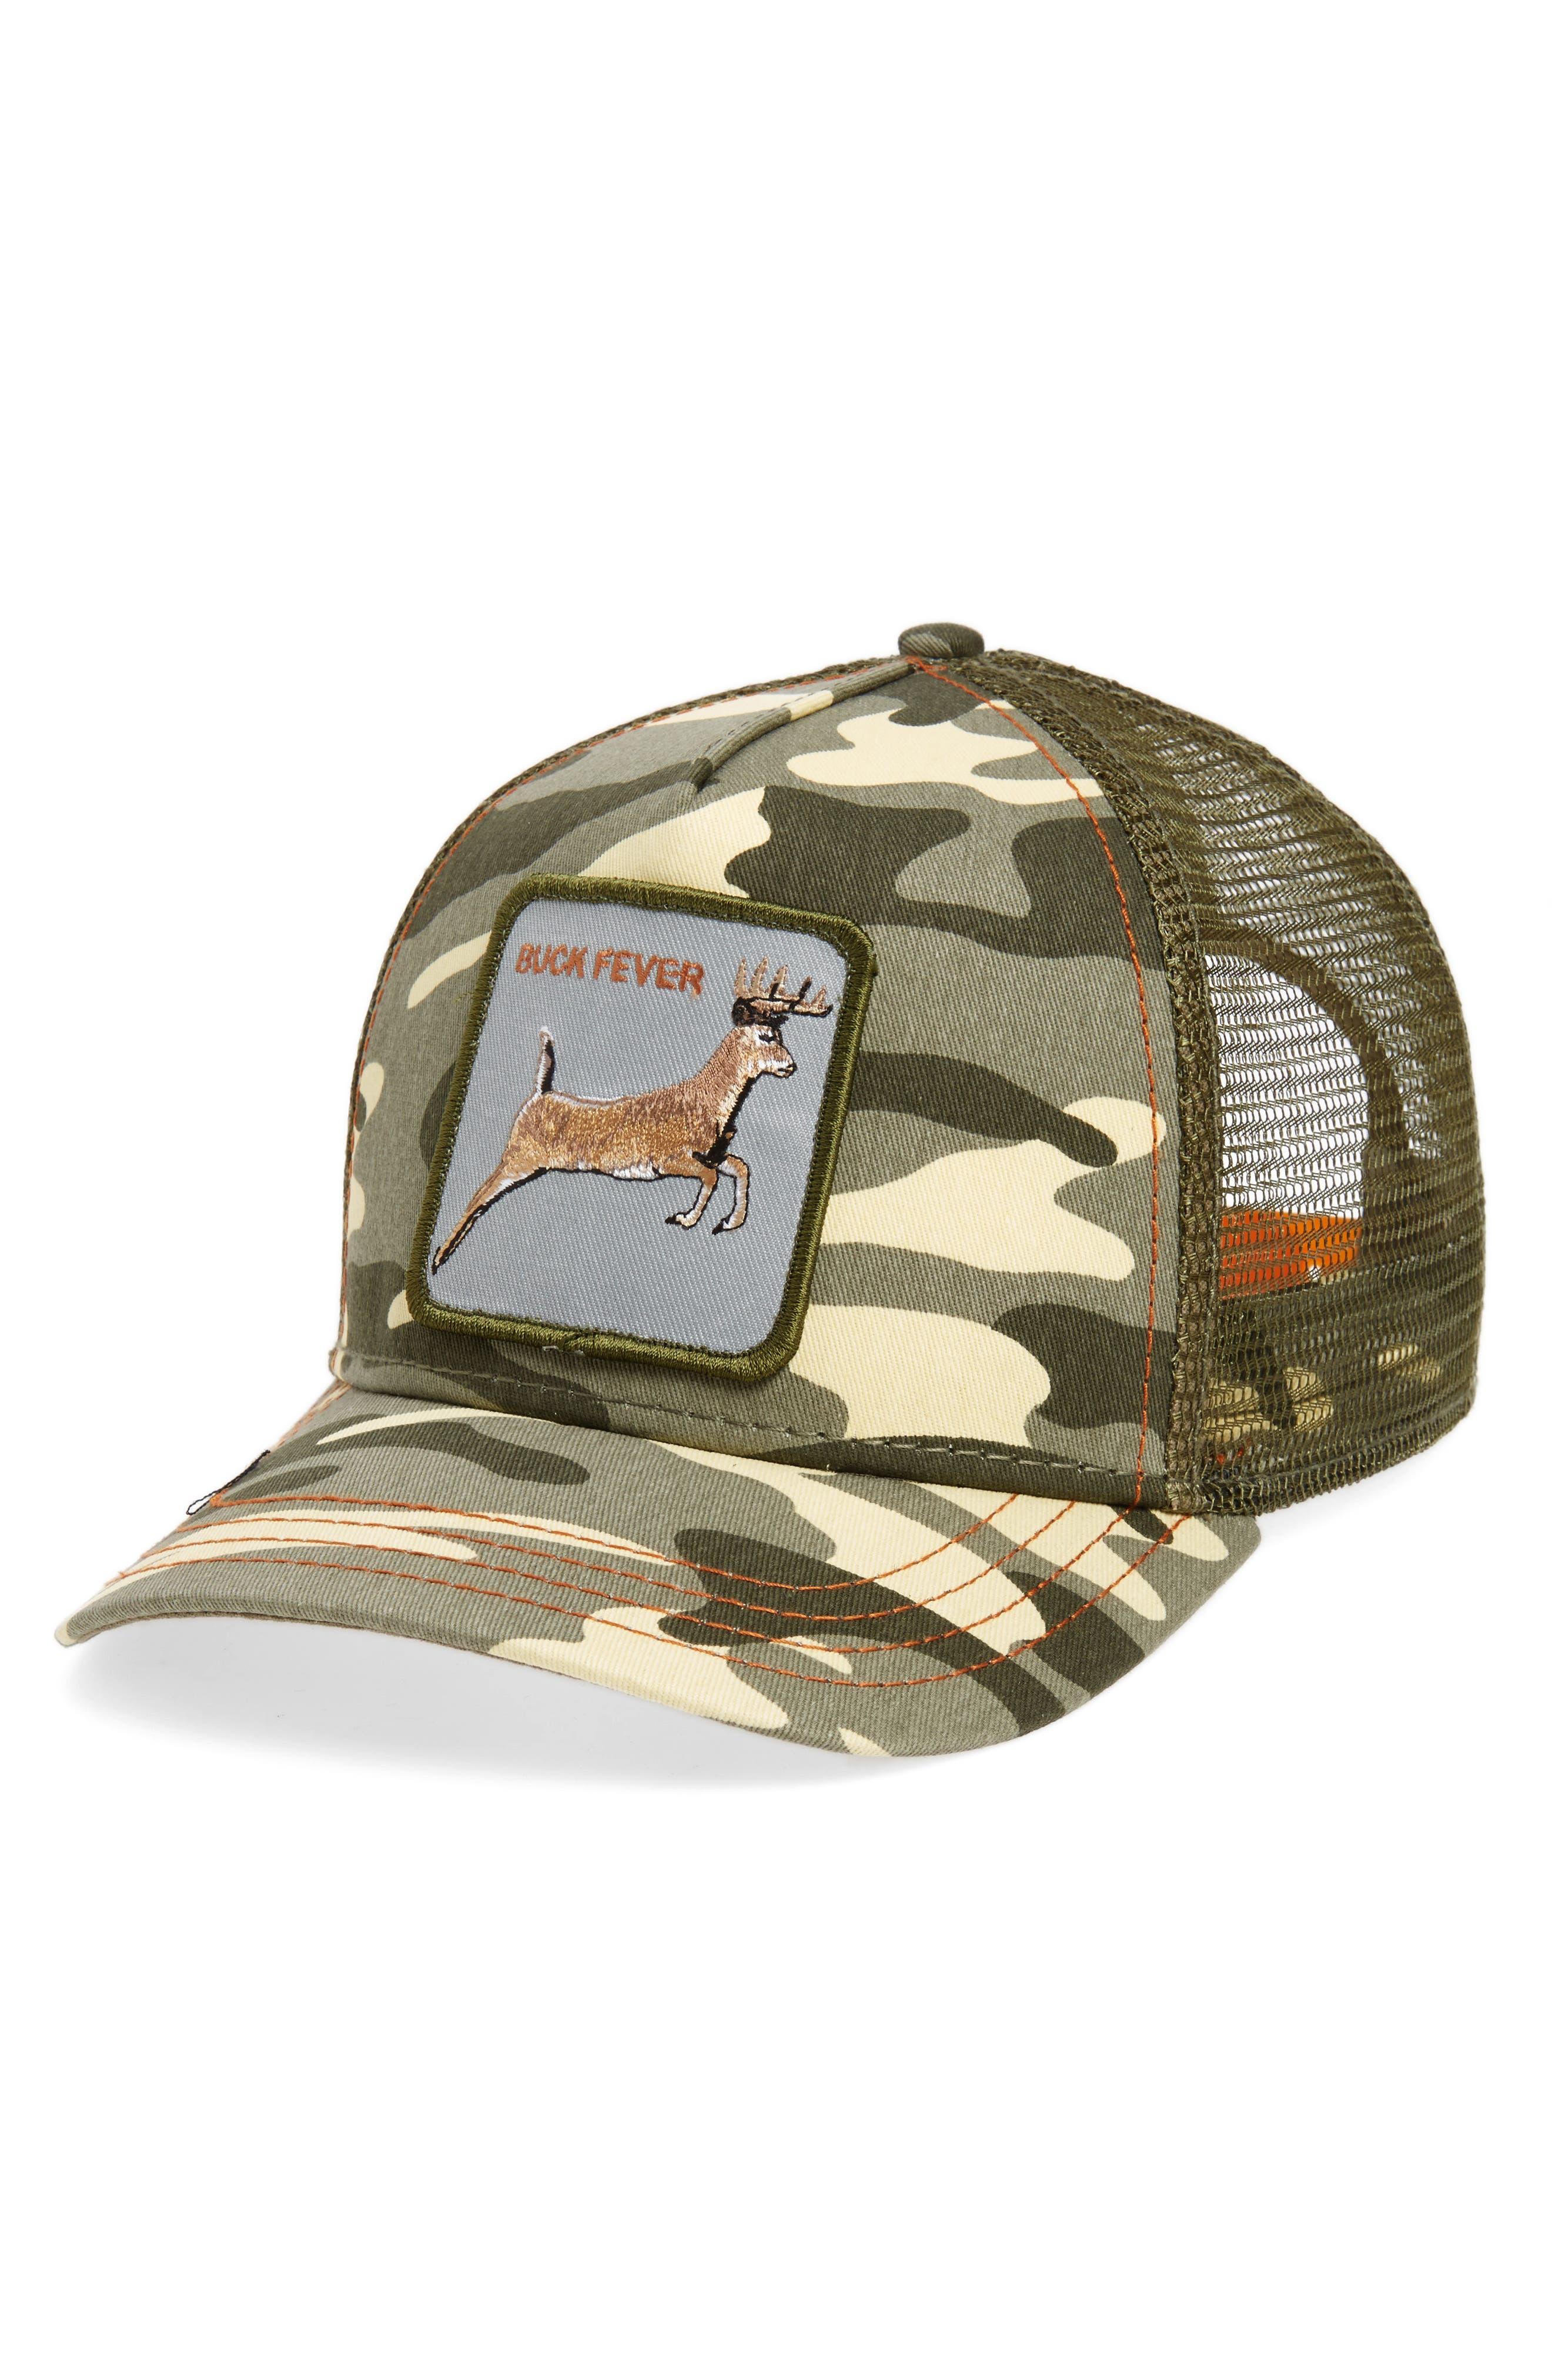 4 Points Trucker Hat,                         Main,                         color, Camo